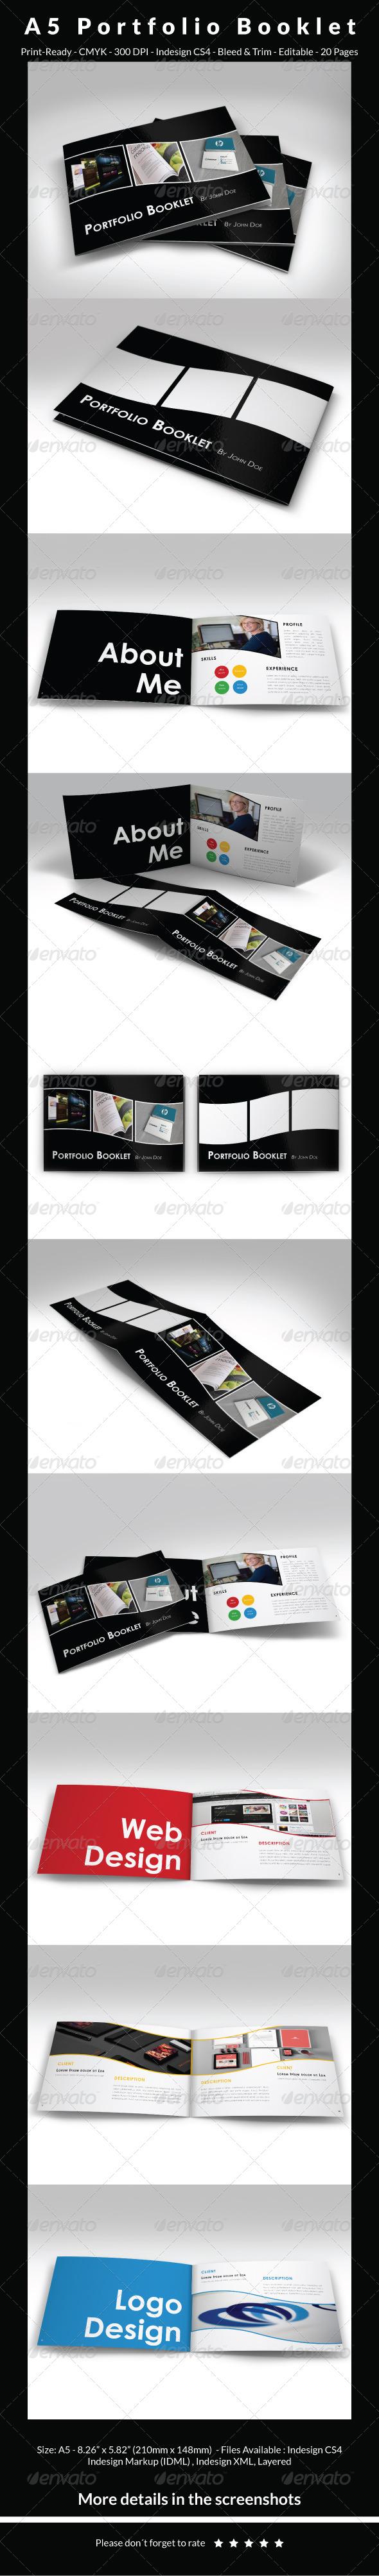 A5 Portfolio Booklet - Portfolio Brochures